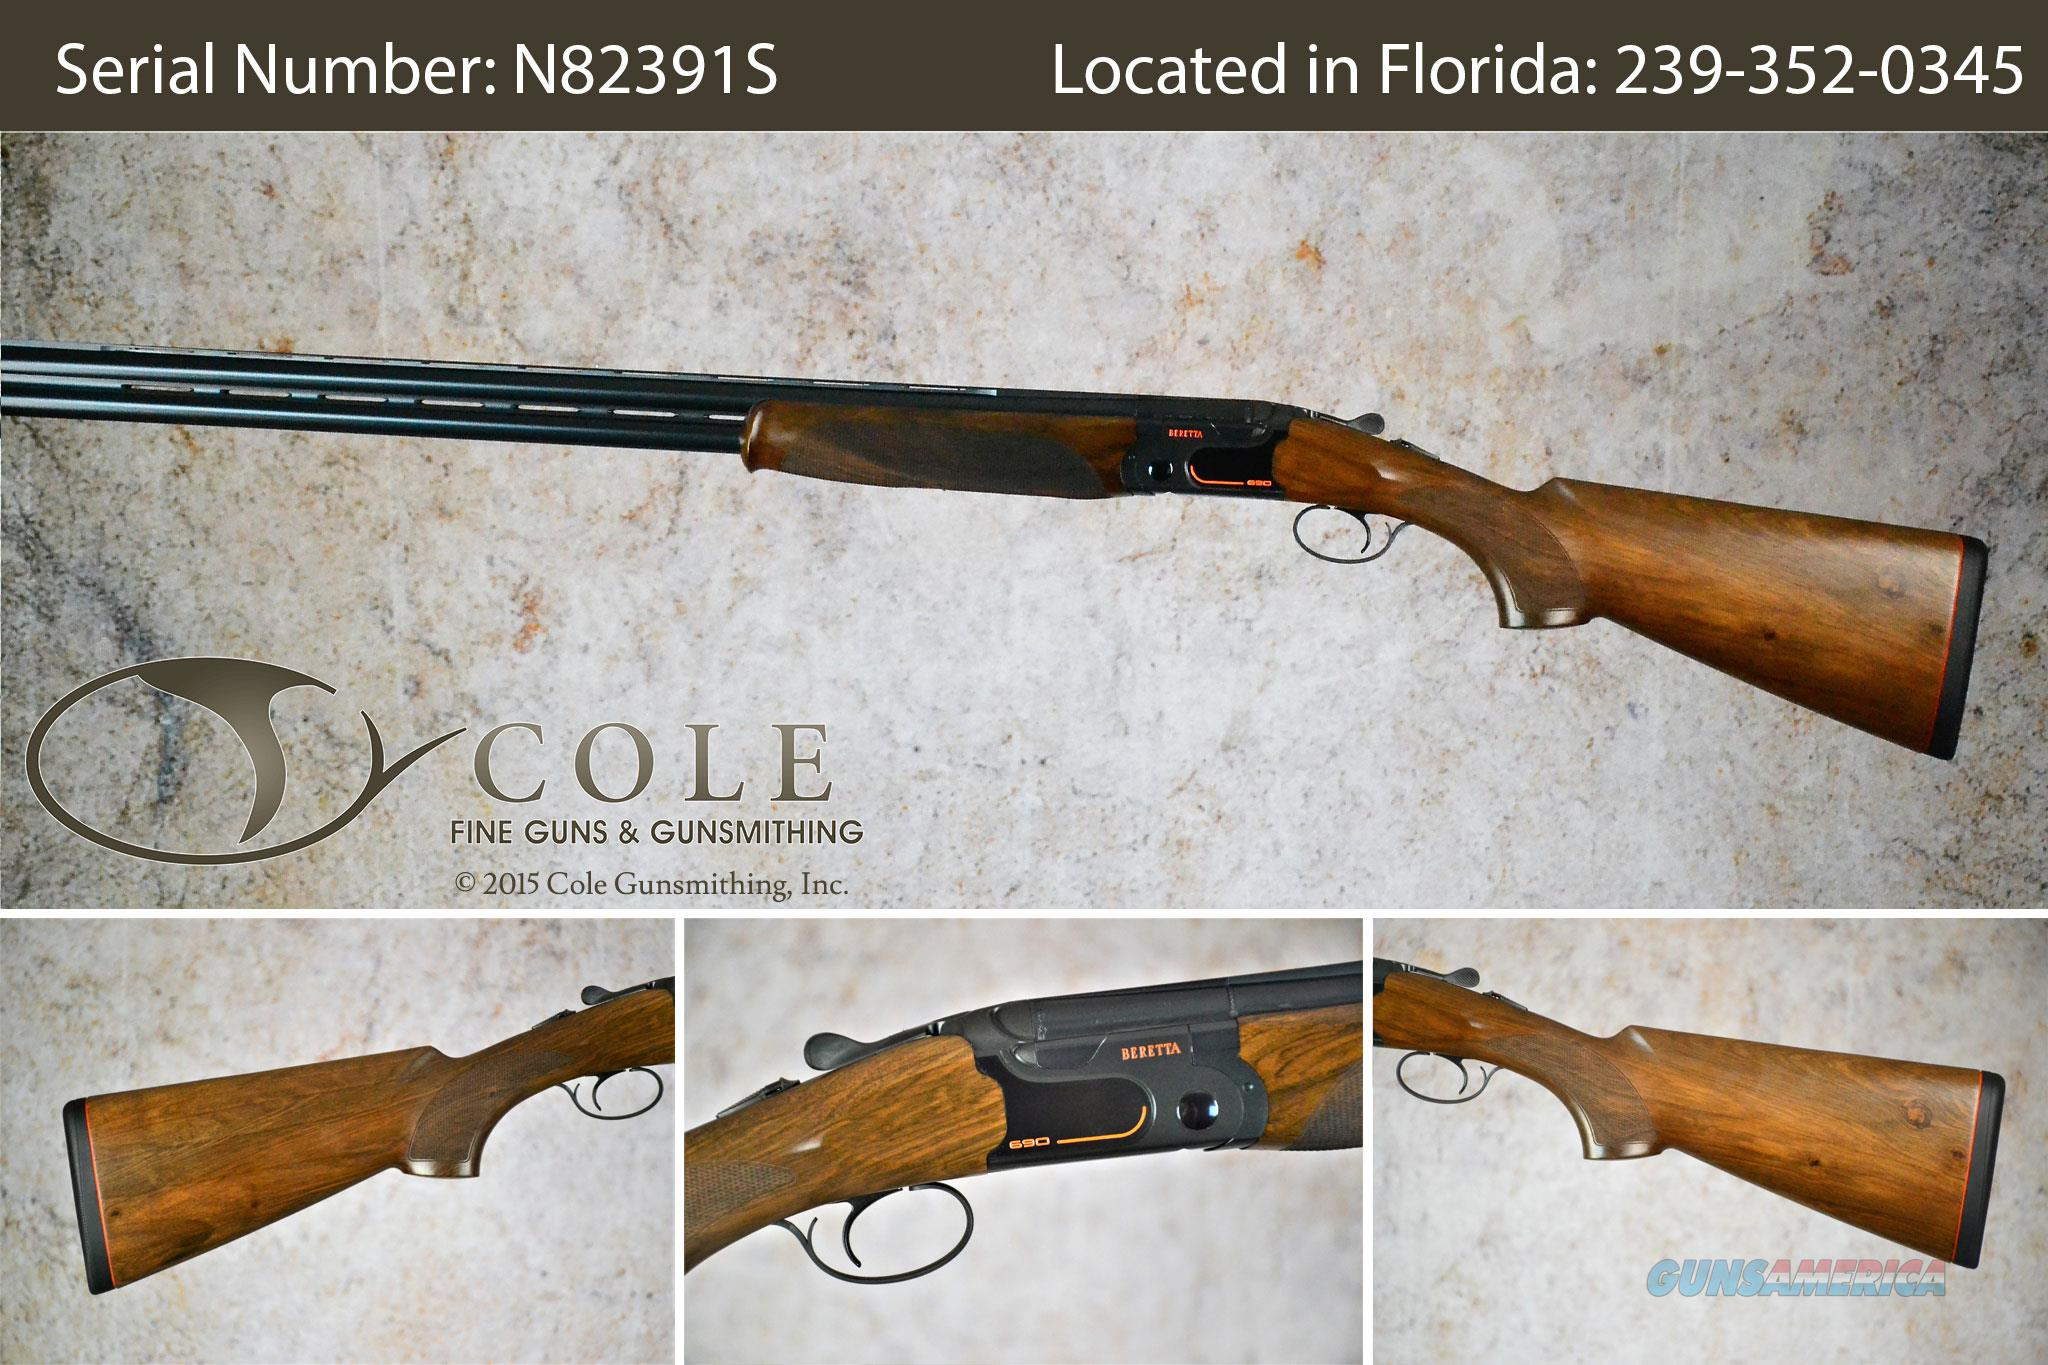 "Beretta 690 Sporting 12g 32"" SN:#N82391S  Guns > Shotguns > Beretta Shotguns > O/U > Trap/Skeet"